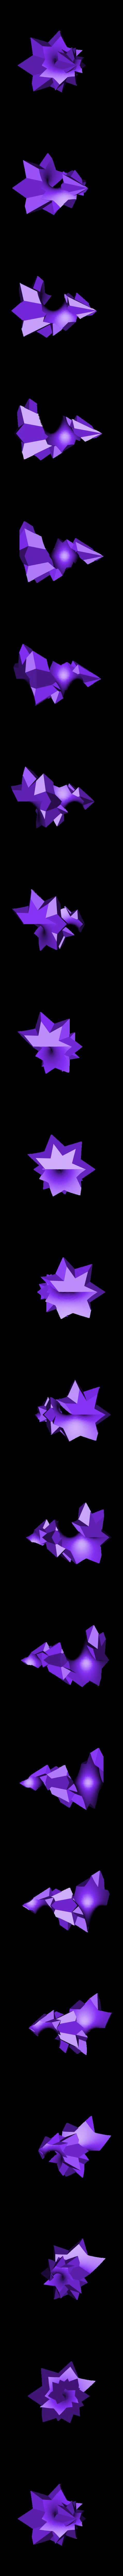 Candy_Cane_Christmas_Tree_-_Red_V2.stl Download free STL file Candy Cane Christmas Tree • 3D printable design, Bugman_140